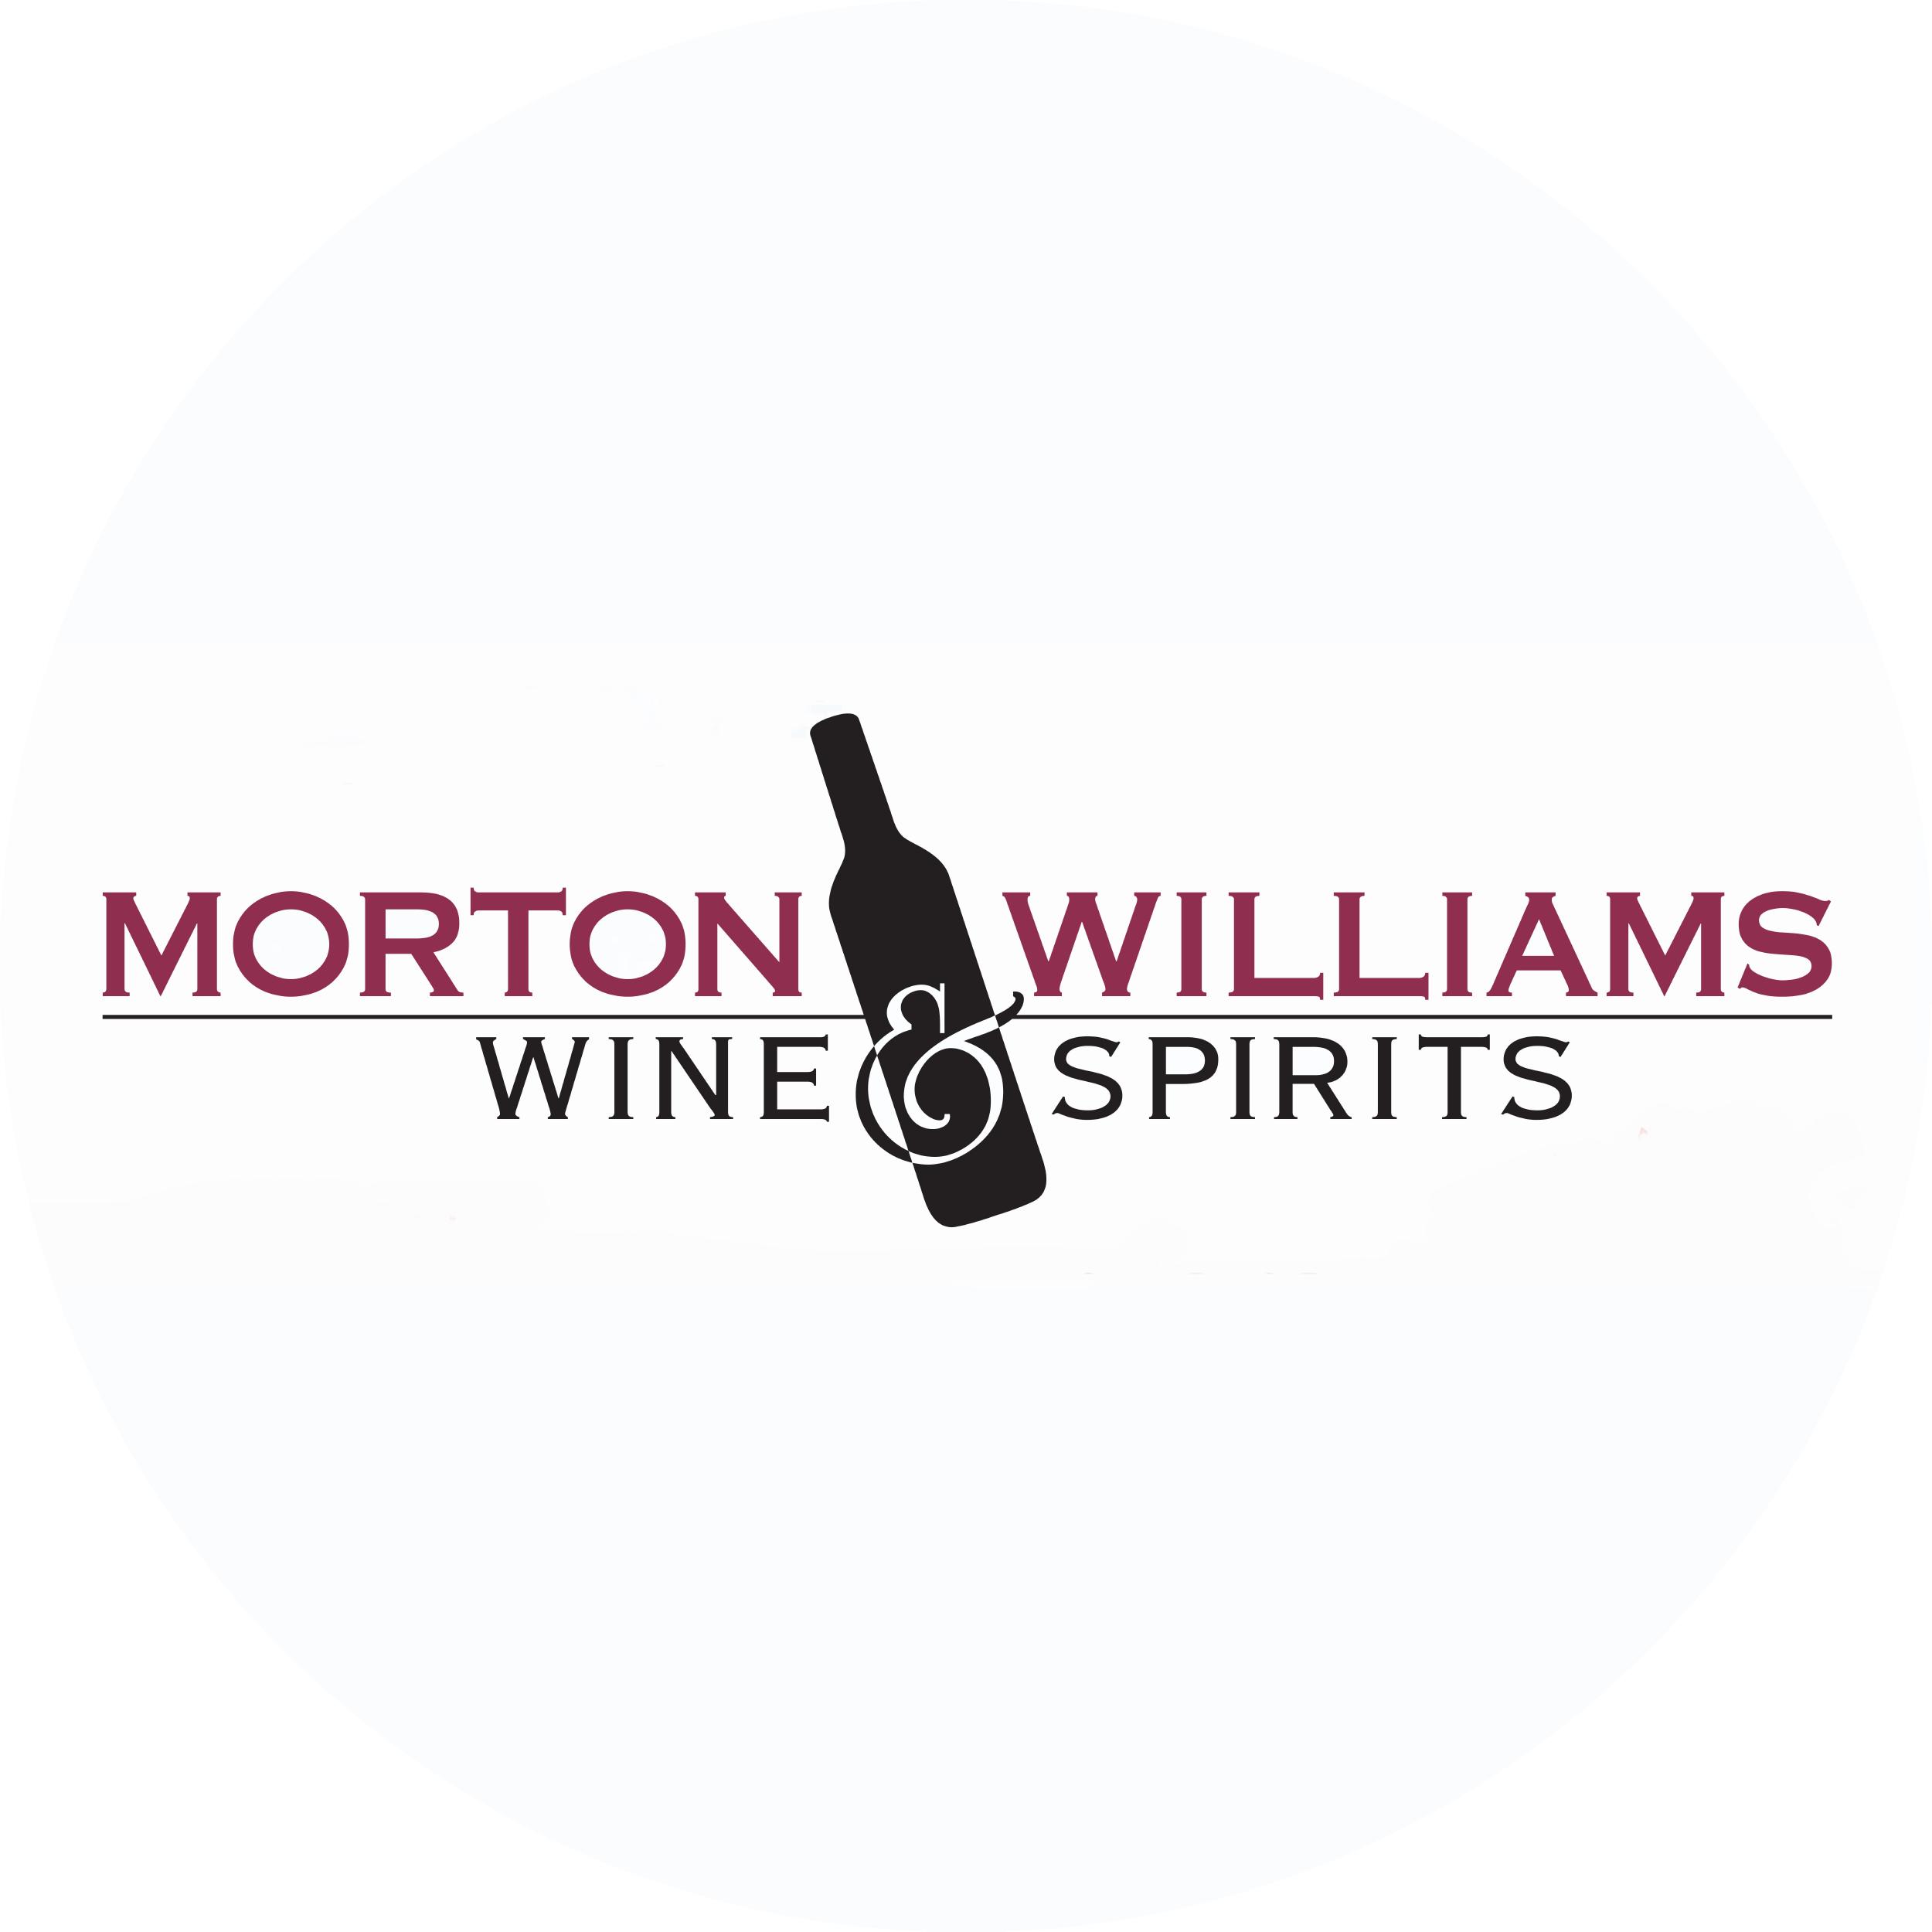 Morton Williams Wine & Spirits logo